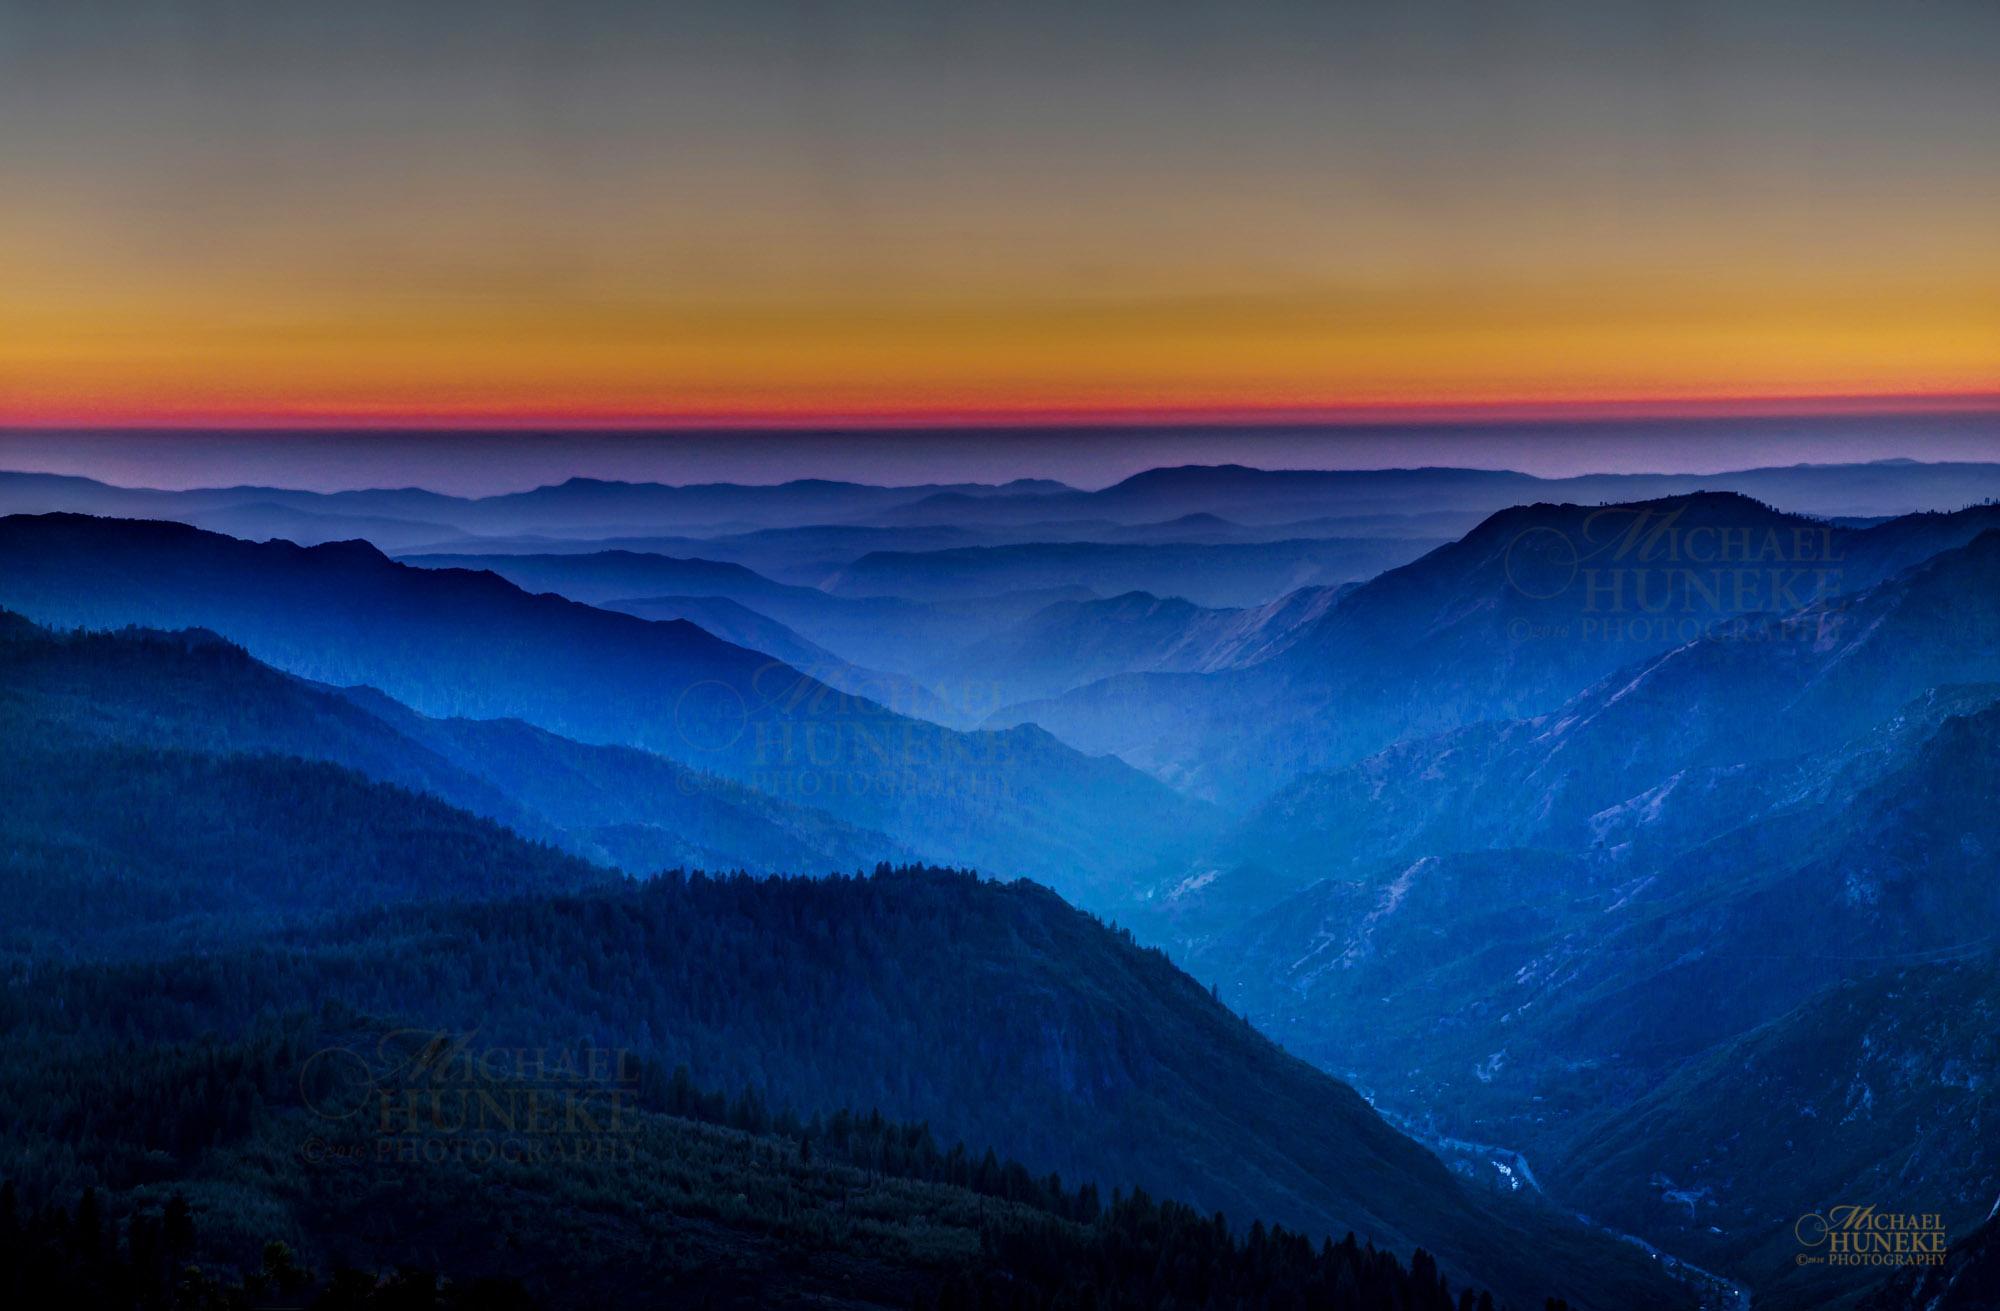 Yosemite_Smoke_Sunset_1-4282_3_4 2000 wide 72dpi high(9) wm.jpg